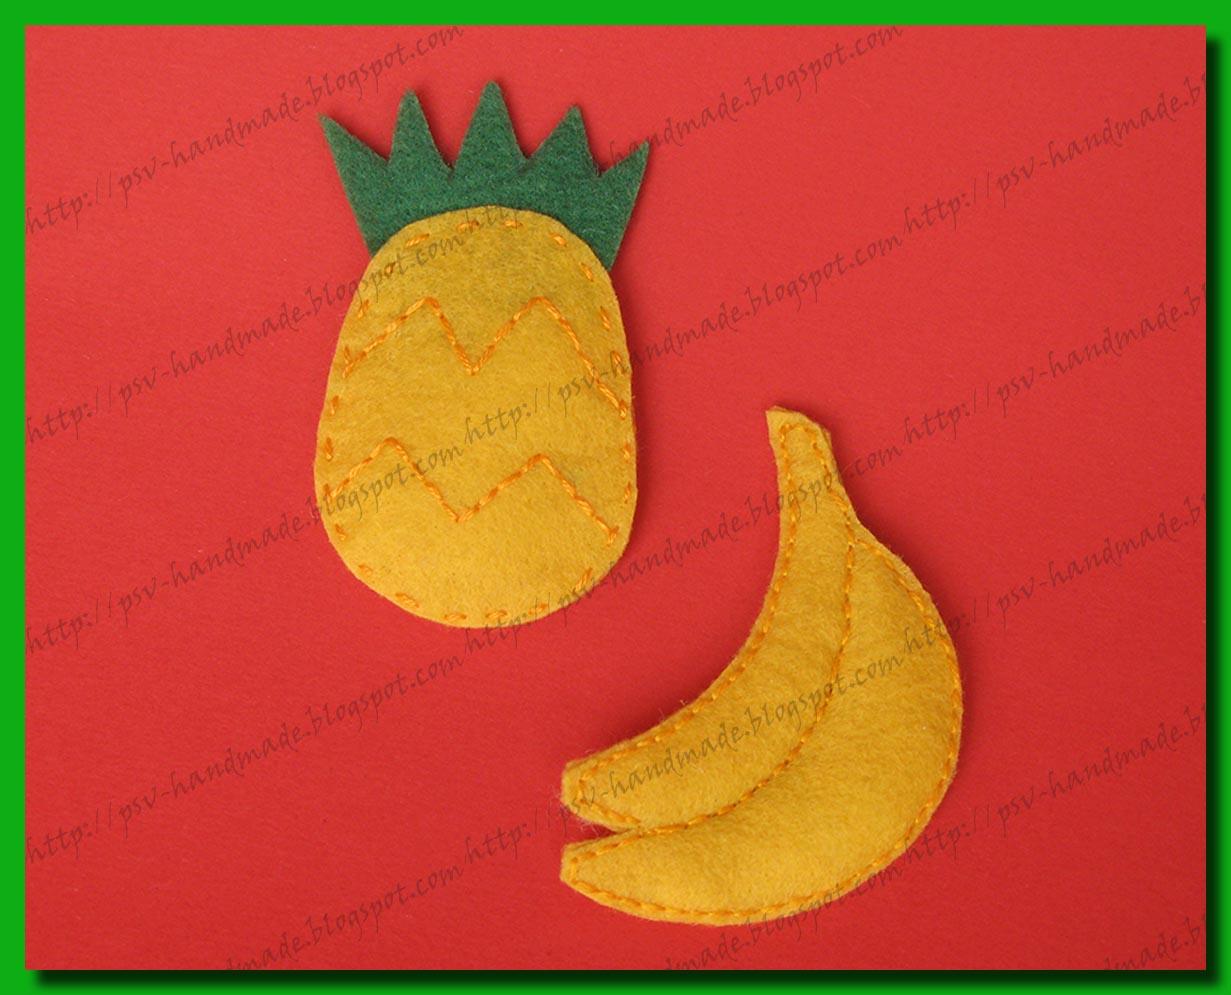 Развивающие игрушки - ананас и банан